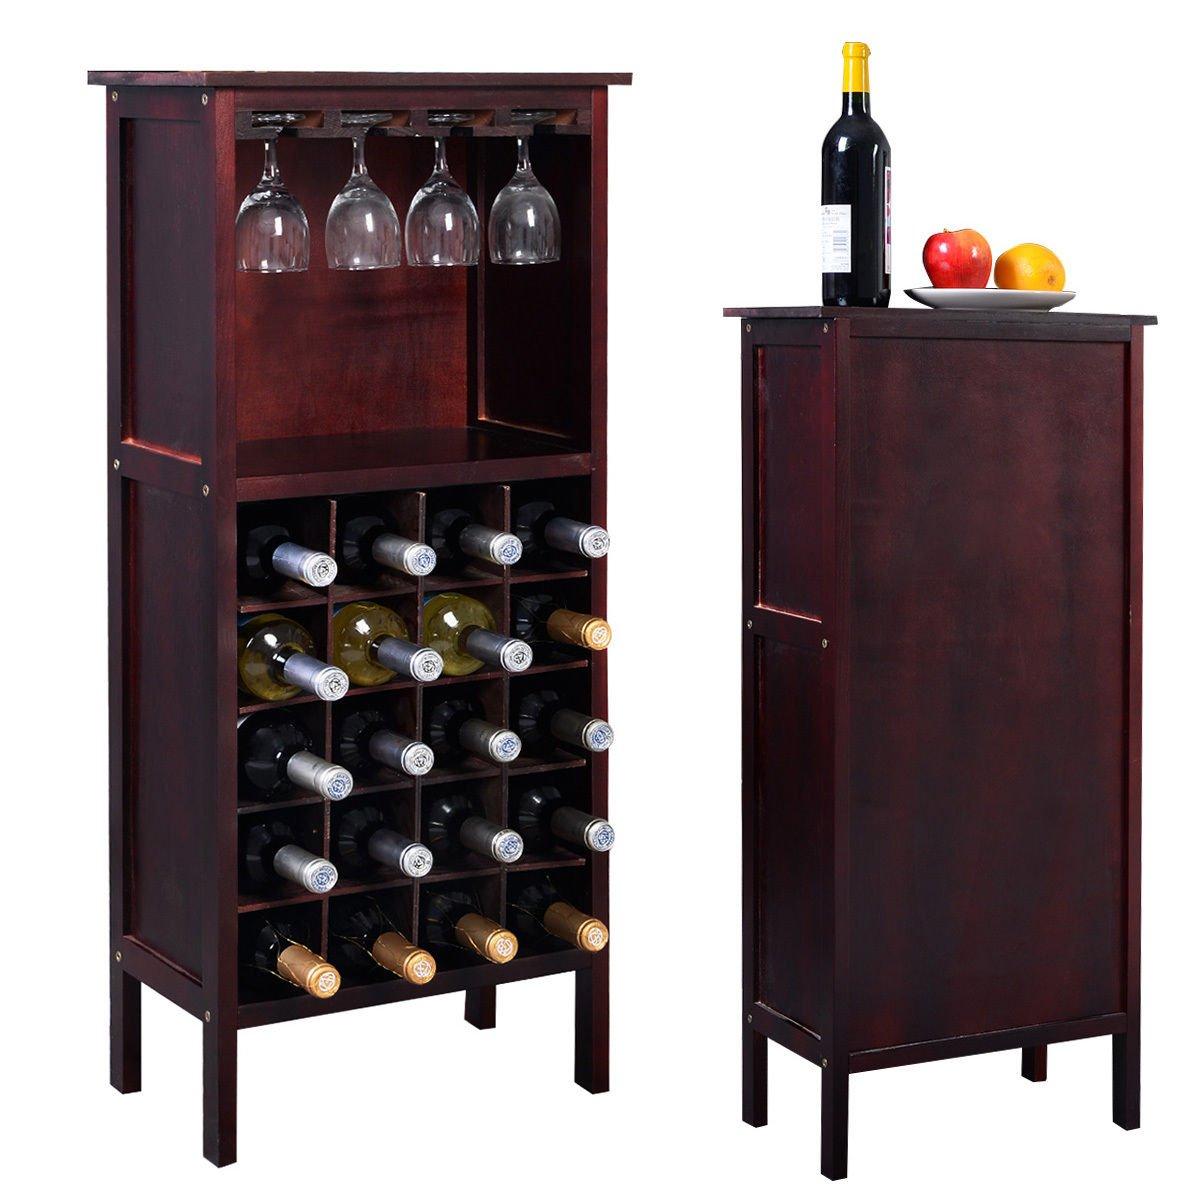 New Wood Wine Cabinet Bottle Holder Storage Kitchen Home Bar w/ Glass Rack by Super Discount Deals